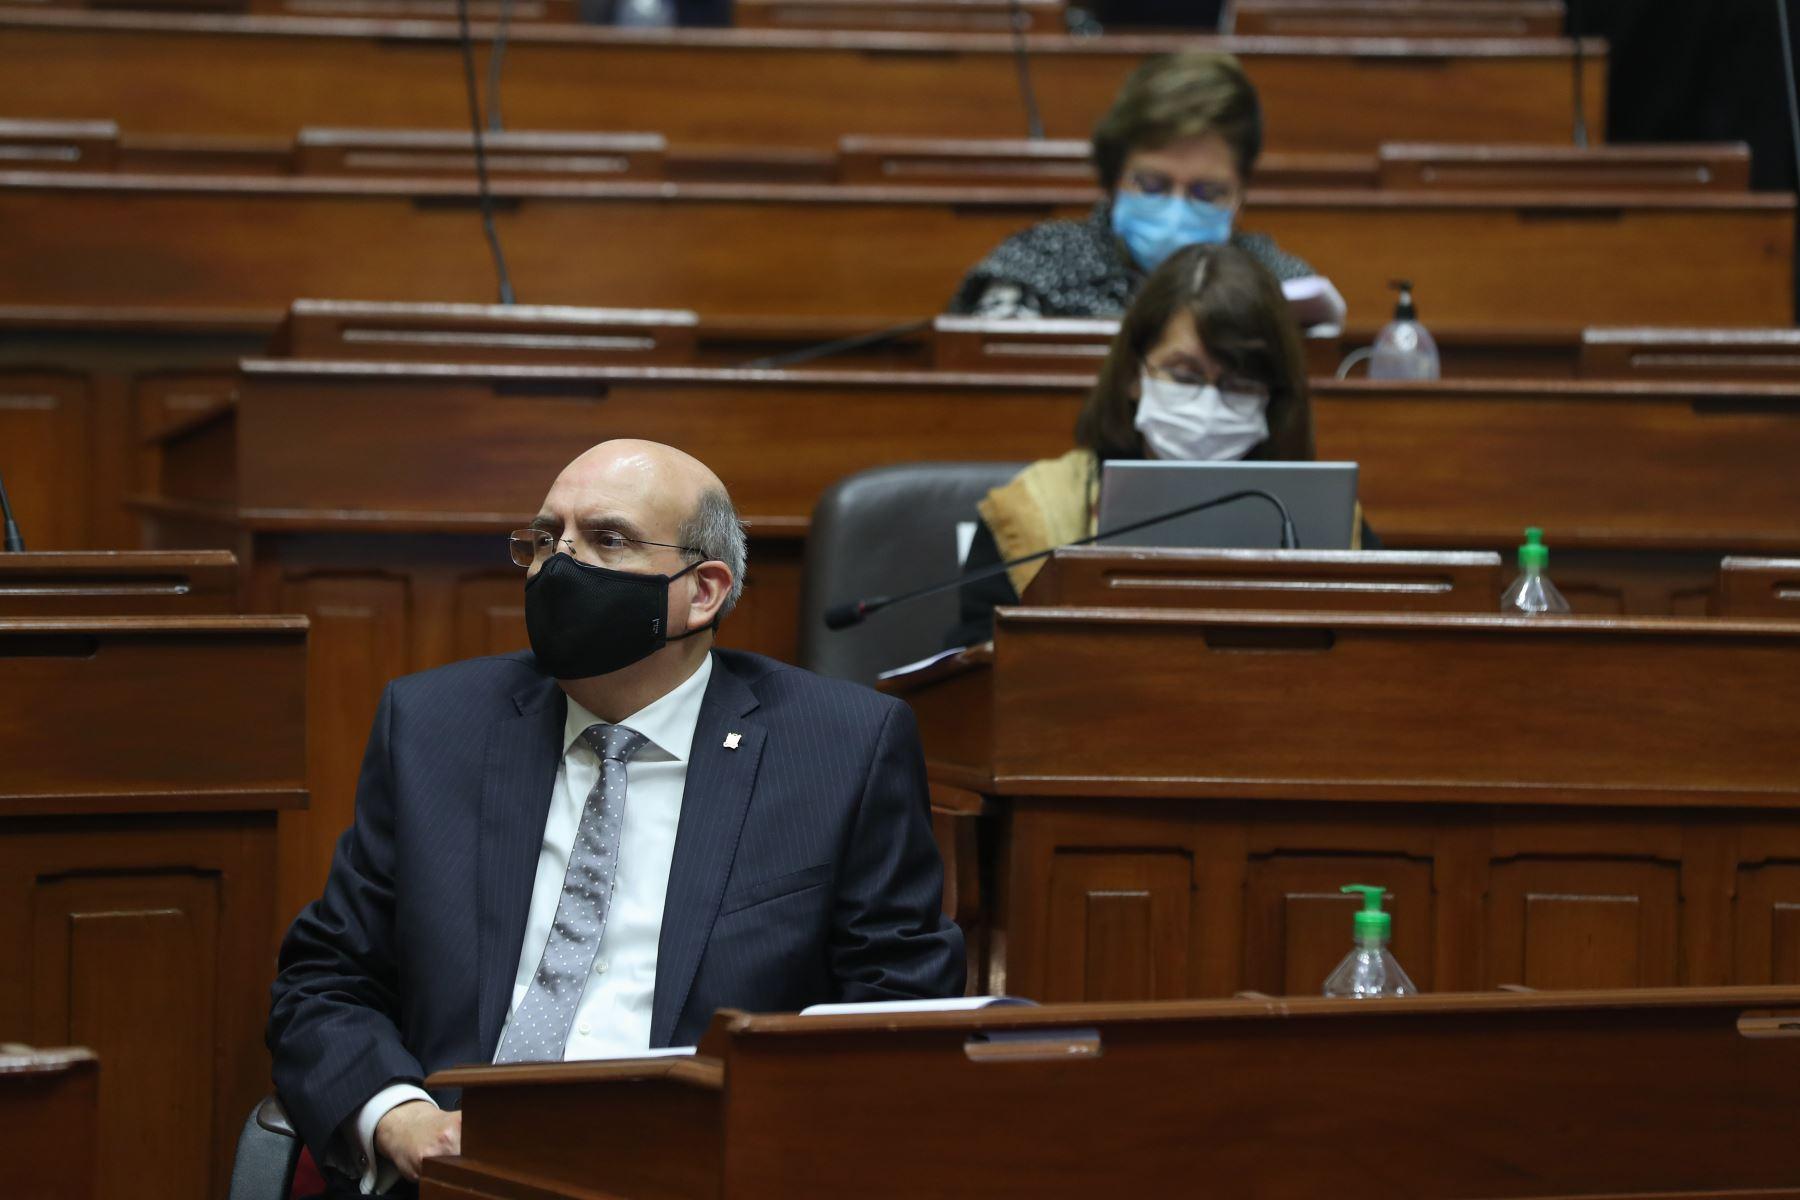 Mario Juvenal Lopez Chávarri, ministro de Relaciones Exteriores, se presenta ante Congreso junto a gabinete ministerial para solicitar voto de confianza. Foto: ANDINA/PCM